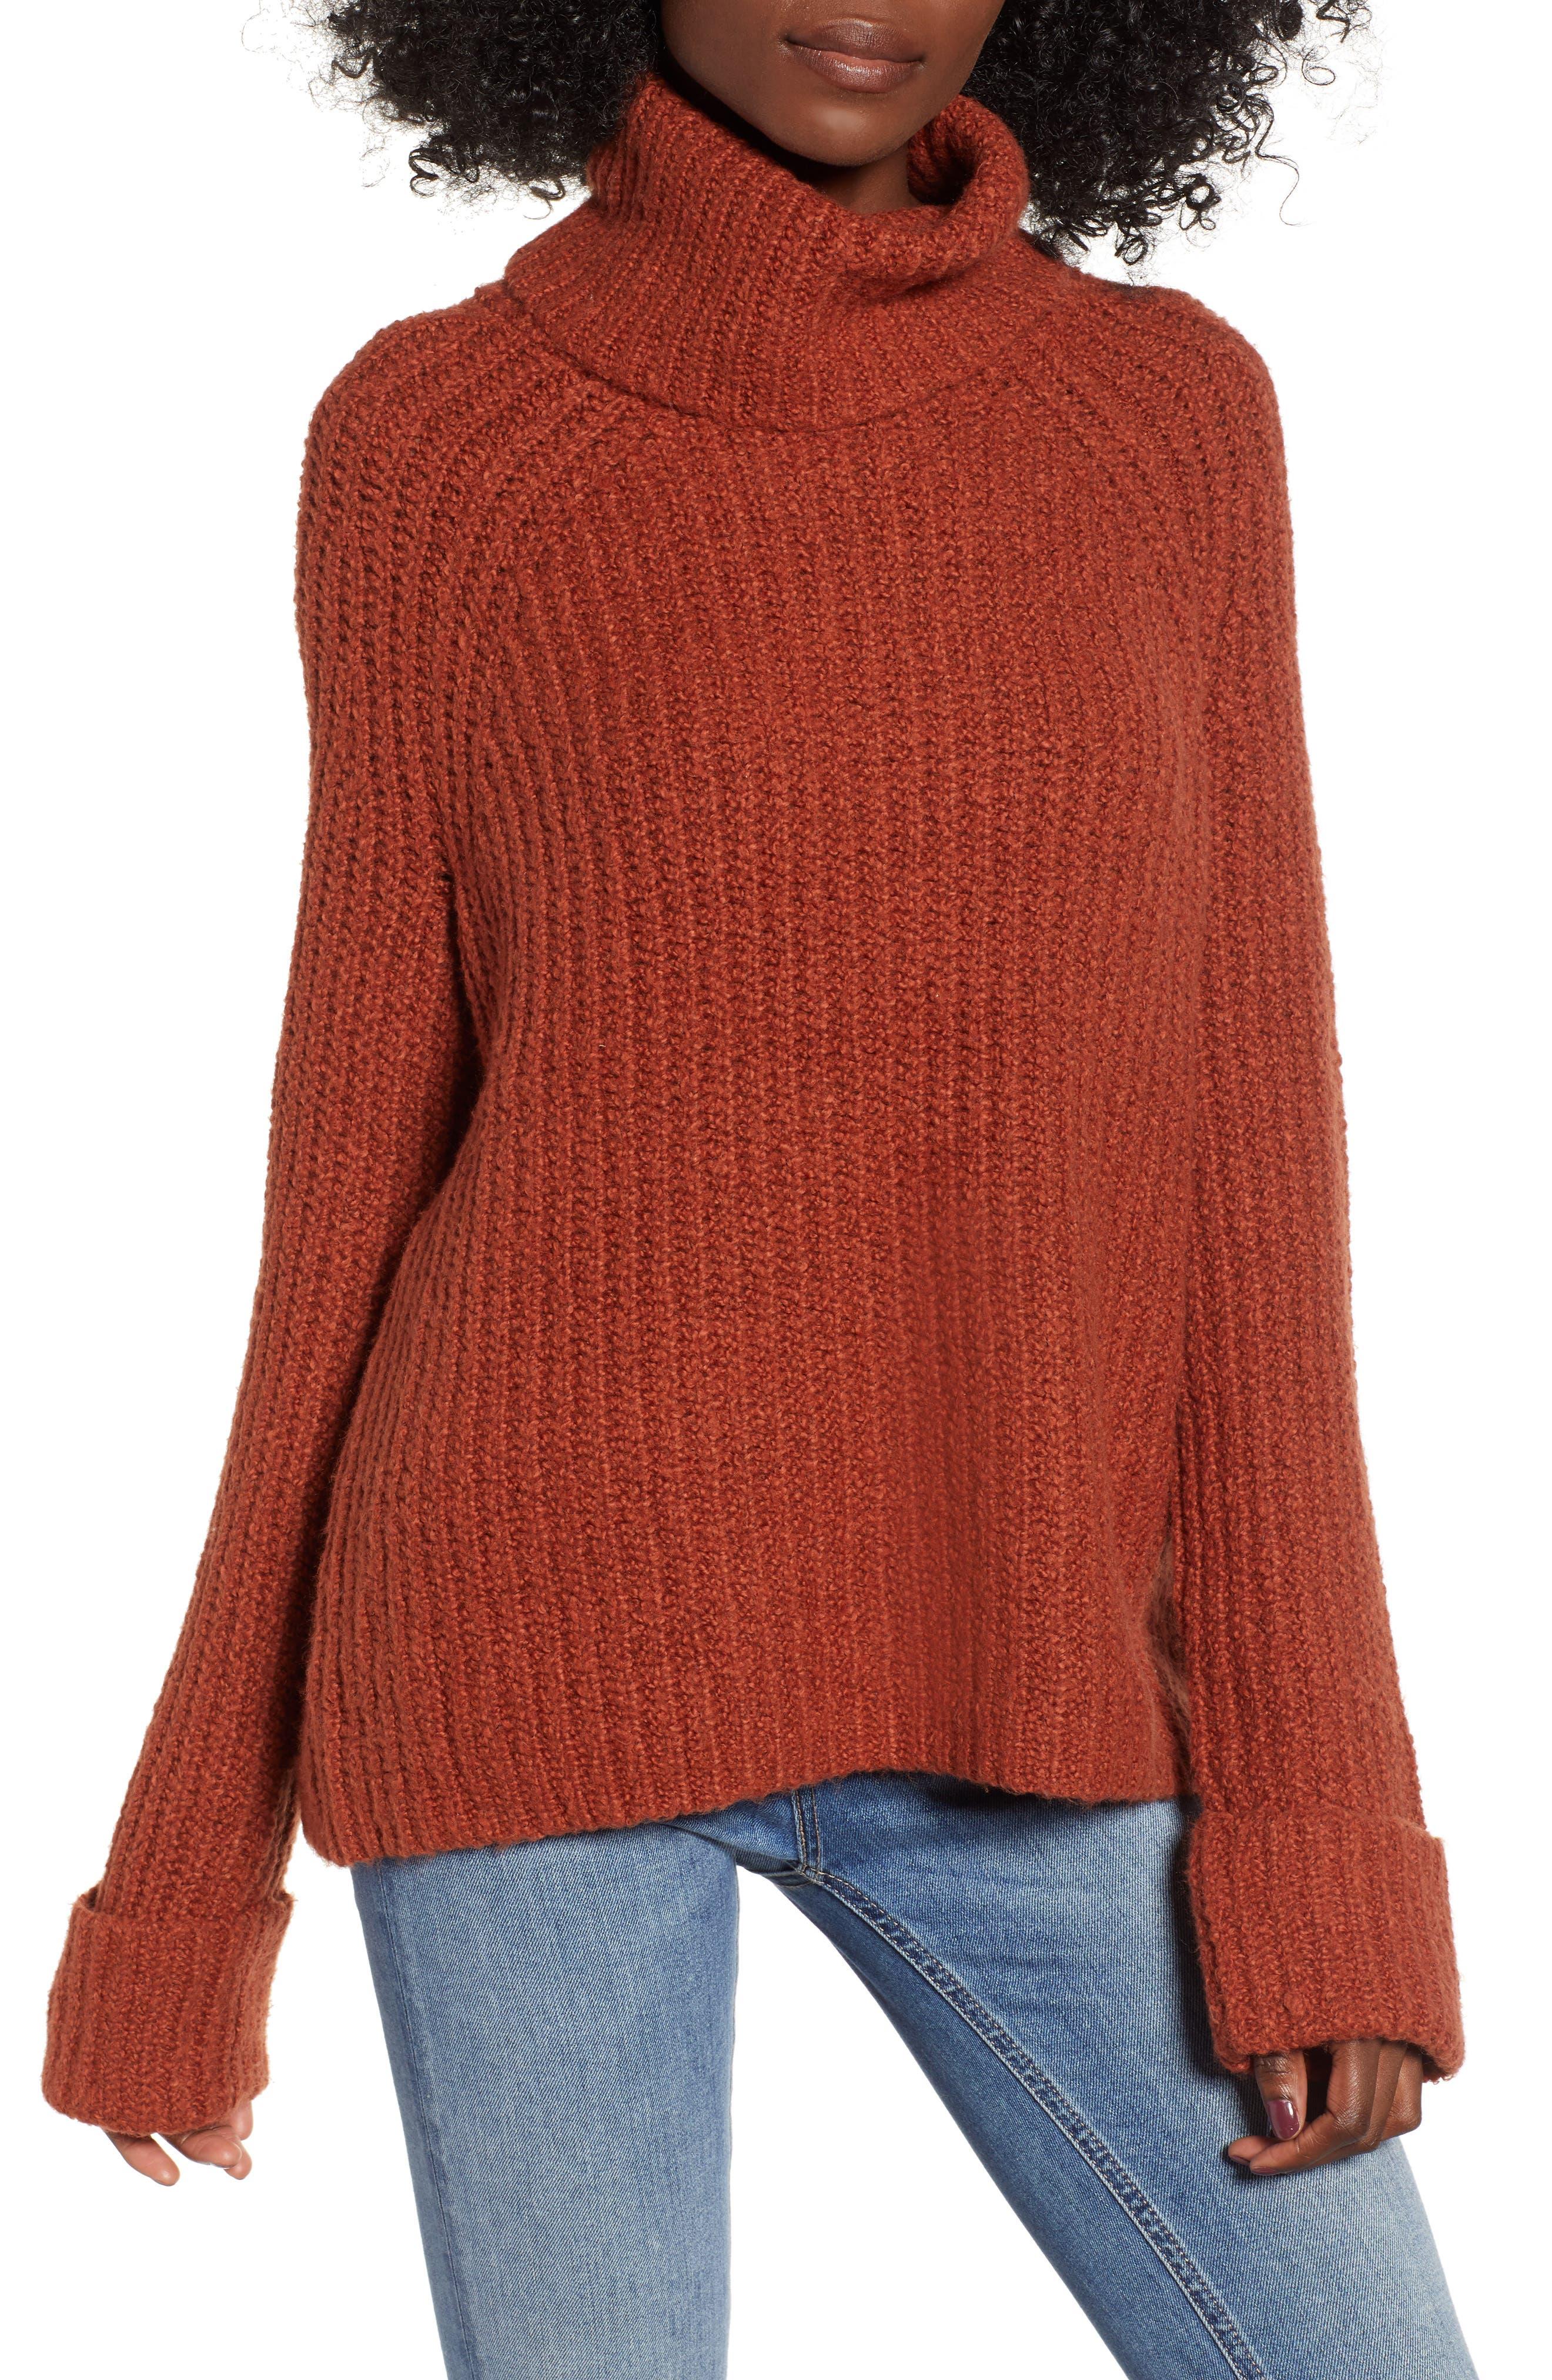 Cozy Turtleneck Sweater,                             Main thumbnail 1, color,                             RUST SEQUOIA